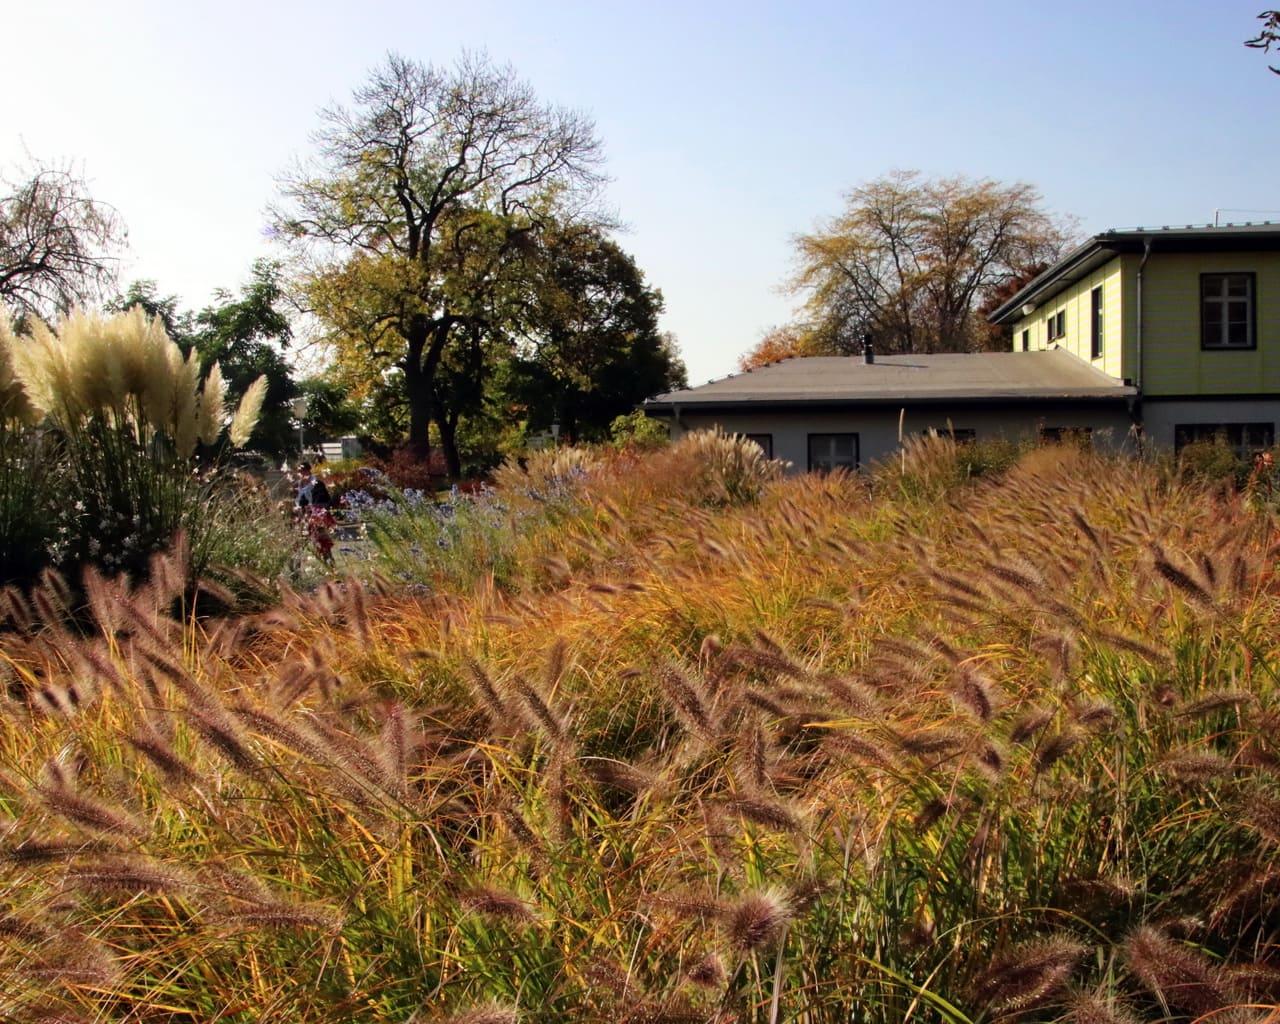 Gräsergarten im ega Park, Planung Petra Pelz 2014, Pennisetum alopecoroides in Herbstfärbung, Pampasgras Cortaderia selloana